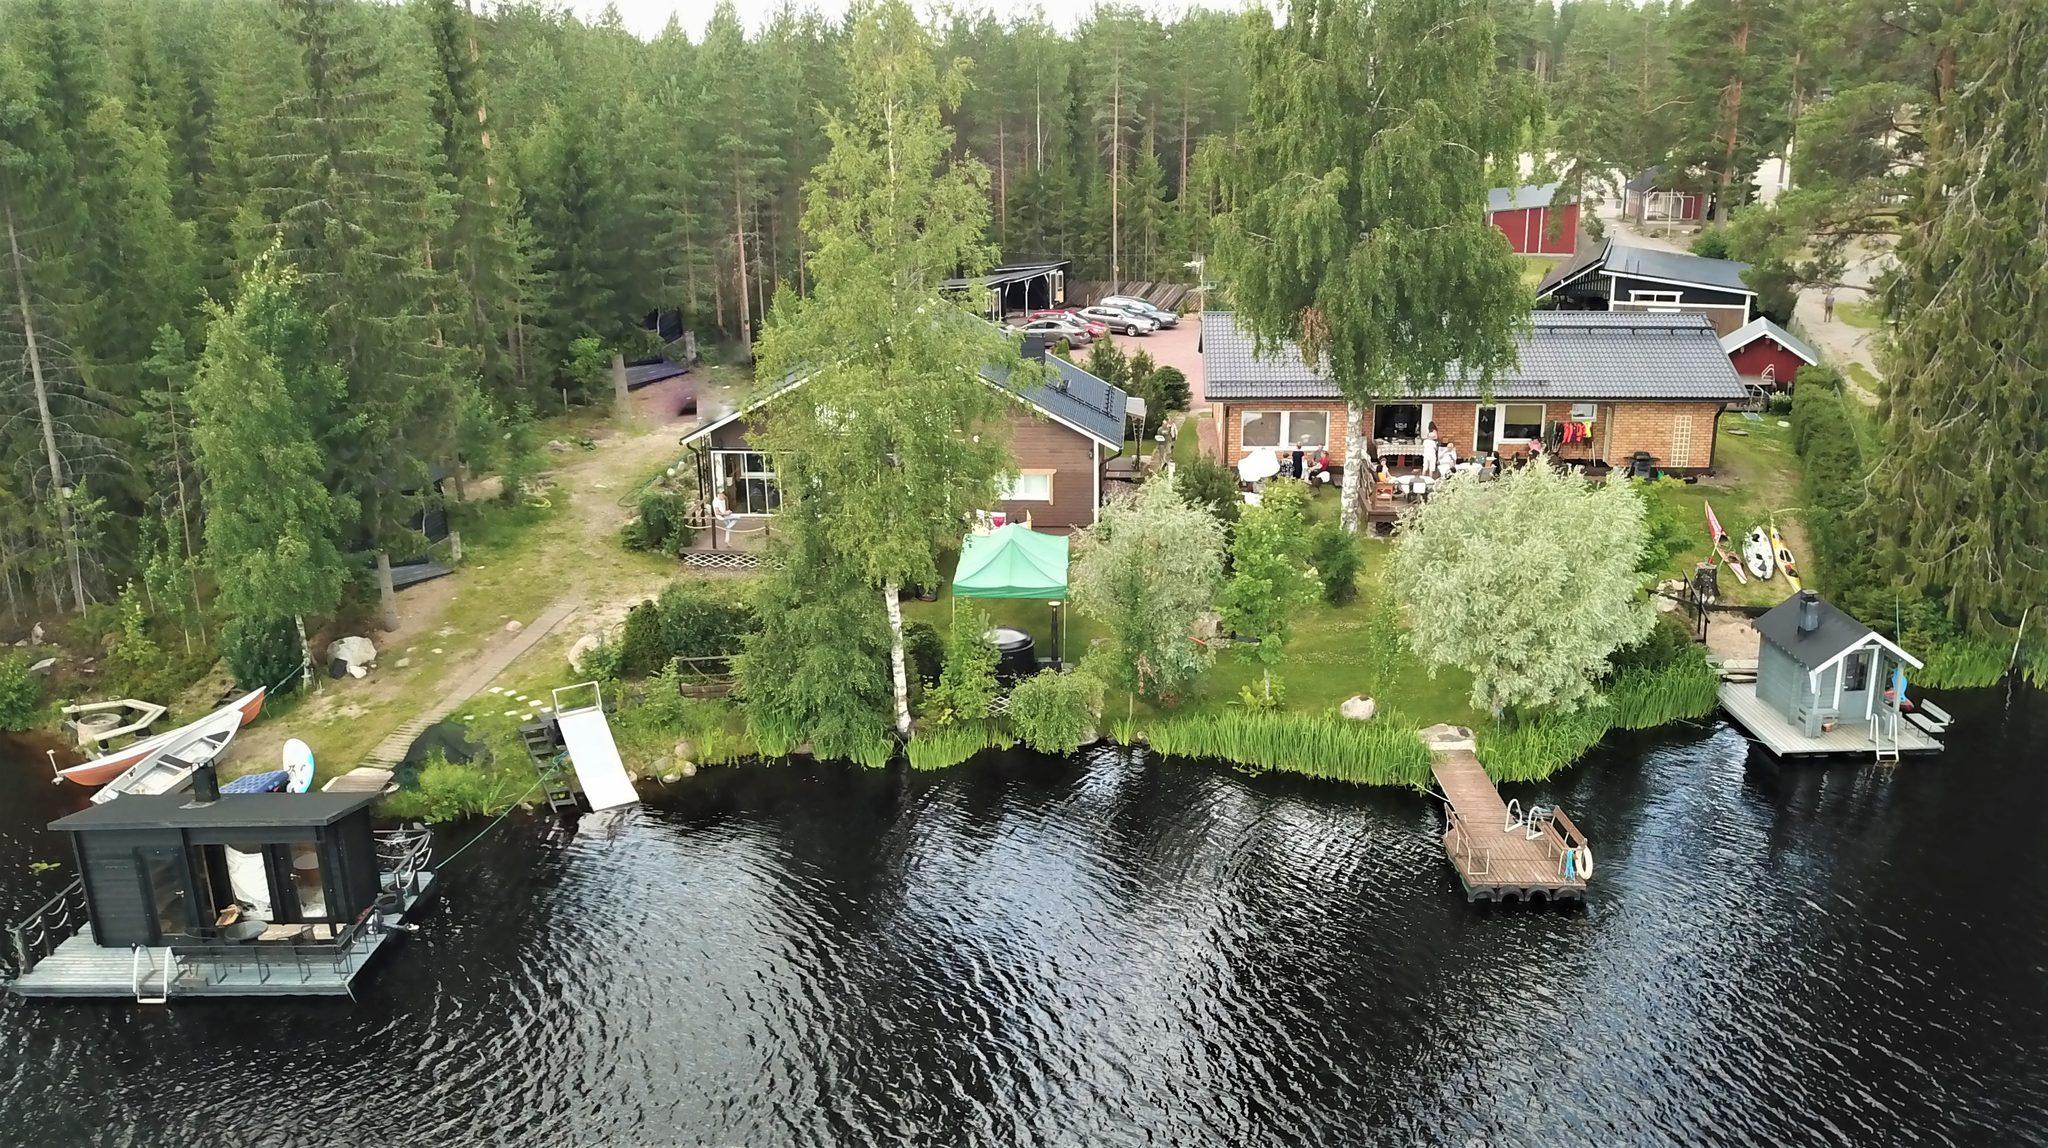 Relax and experience nature in Käenkoski, Parkano